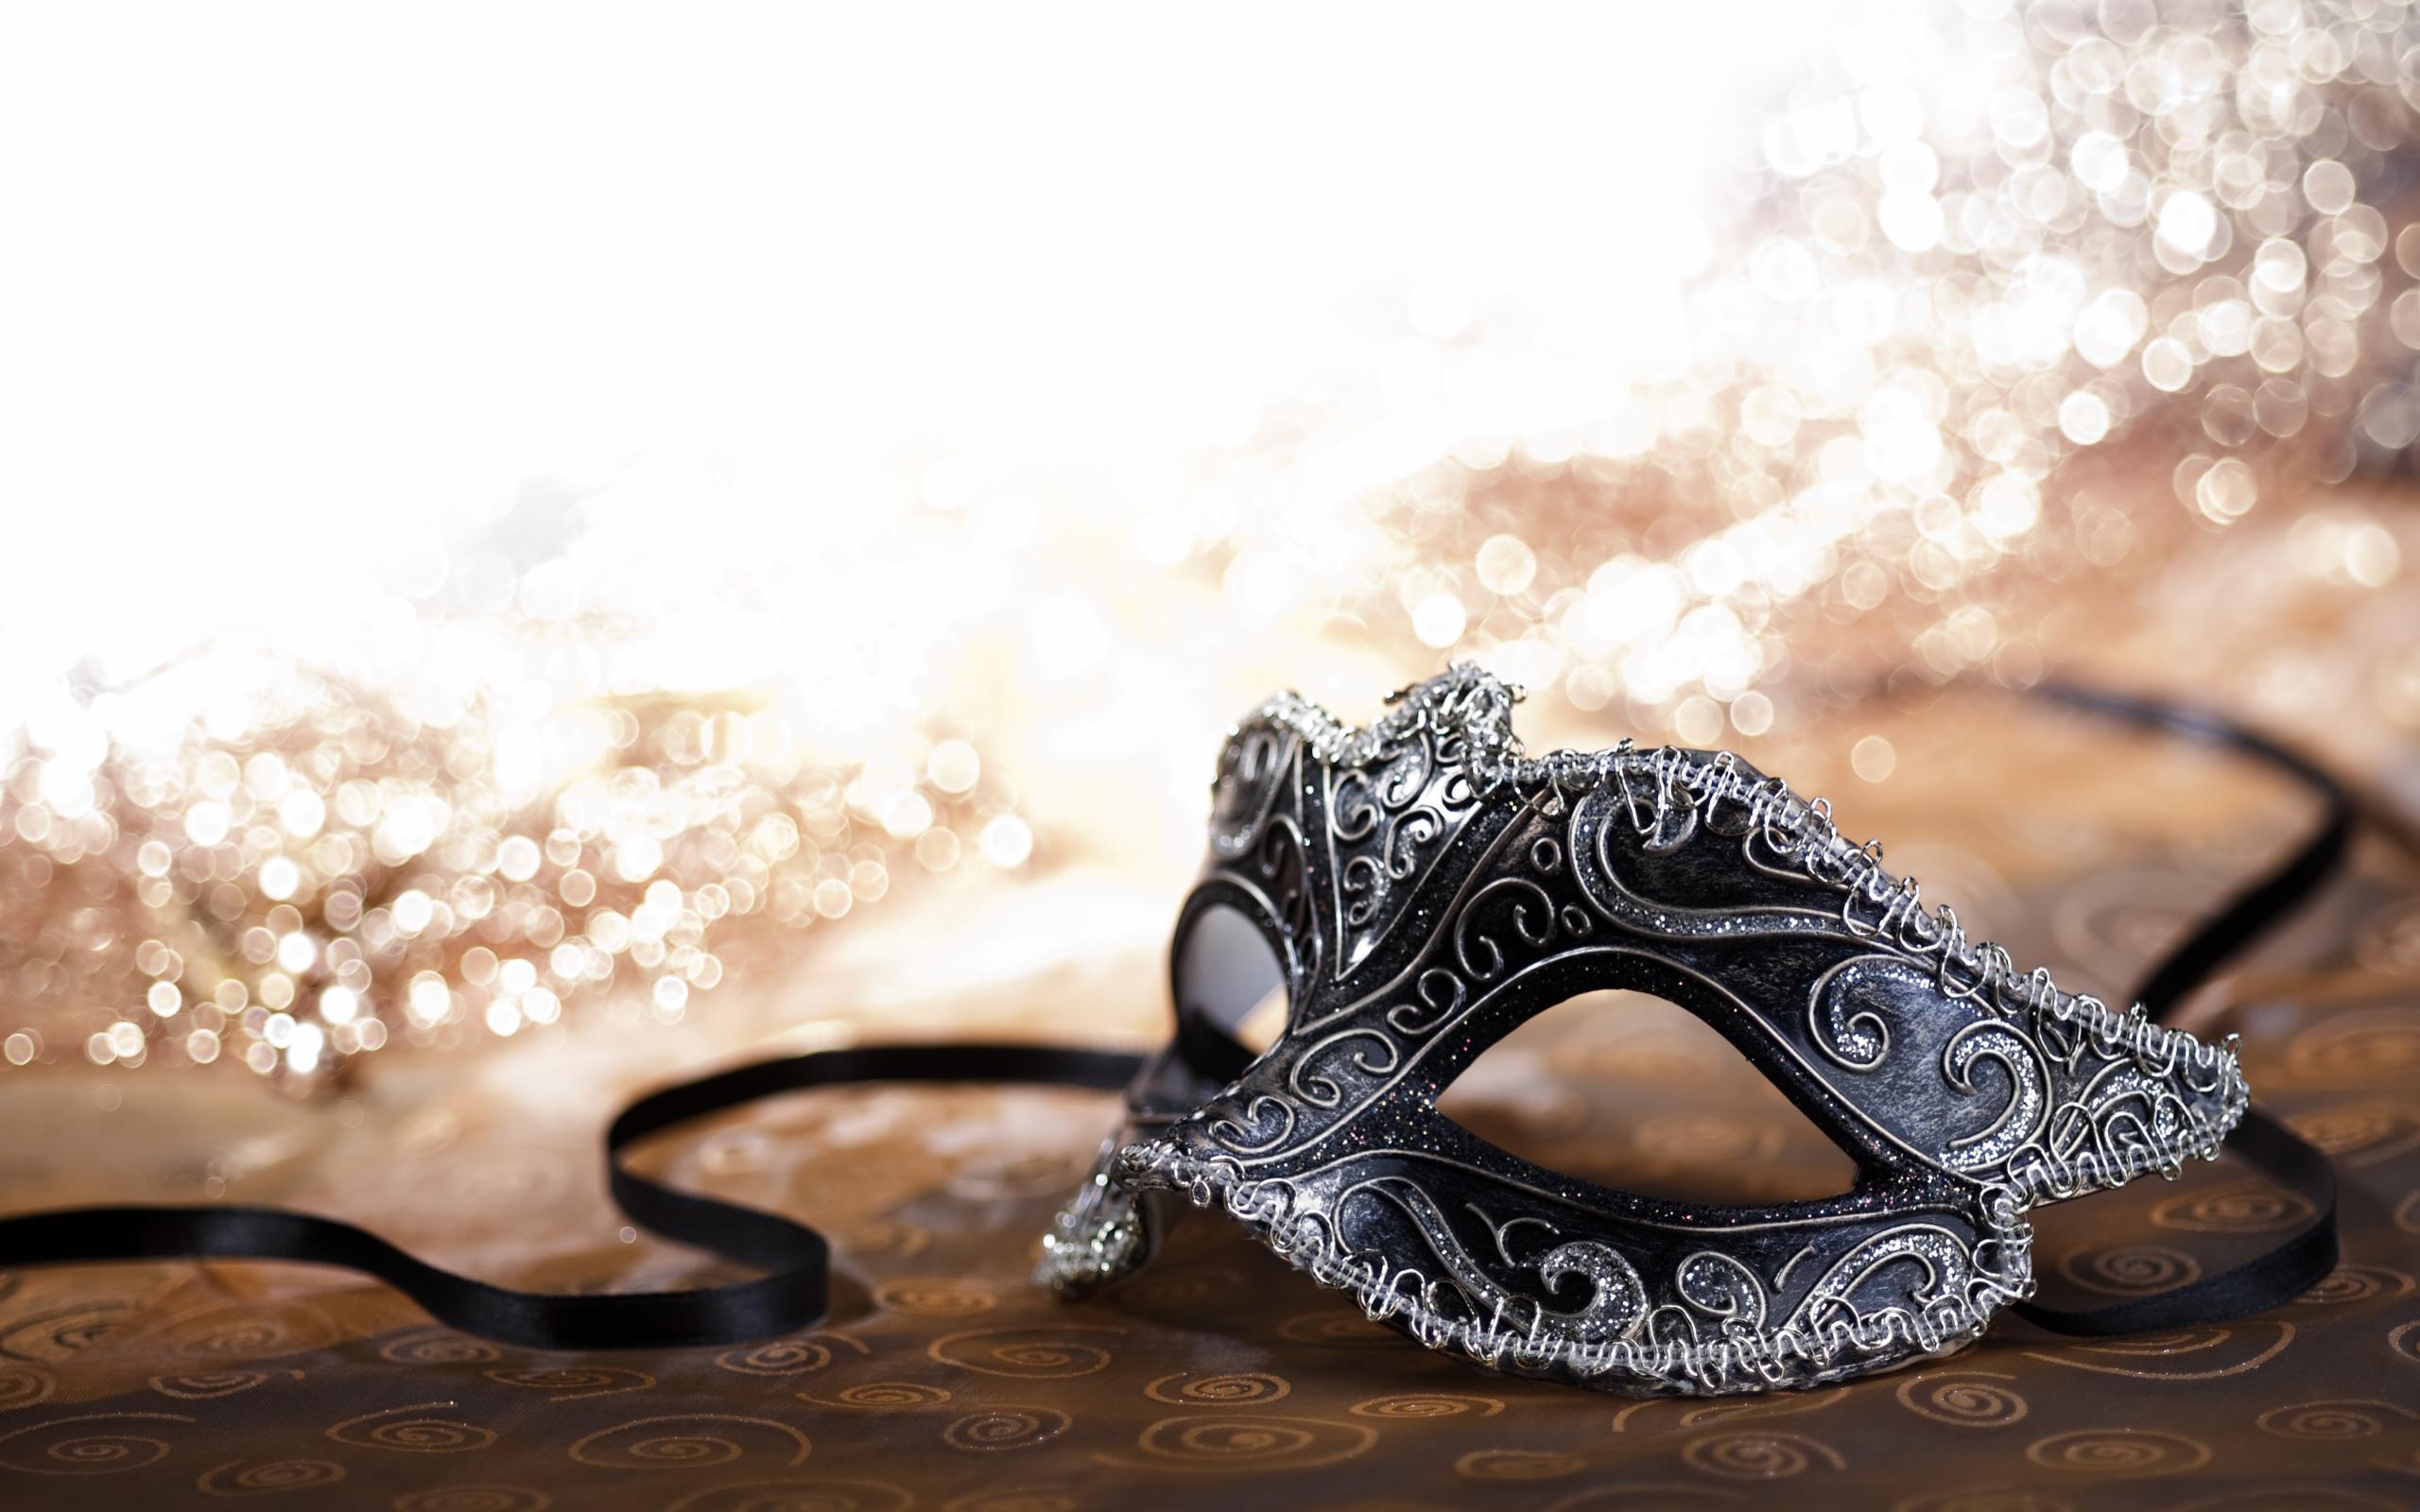 enGene Holiday Party: Masquerade Ball